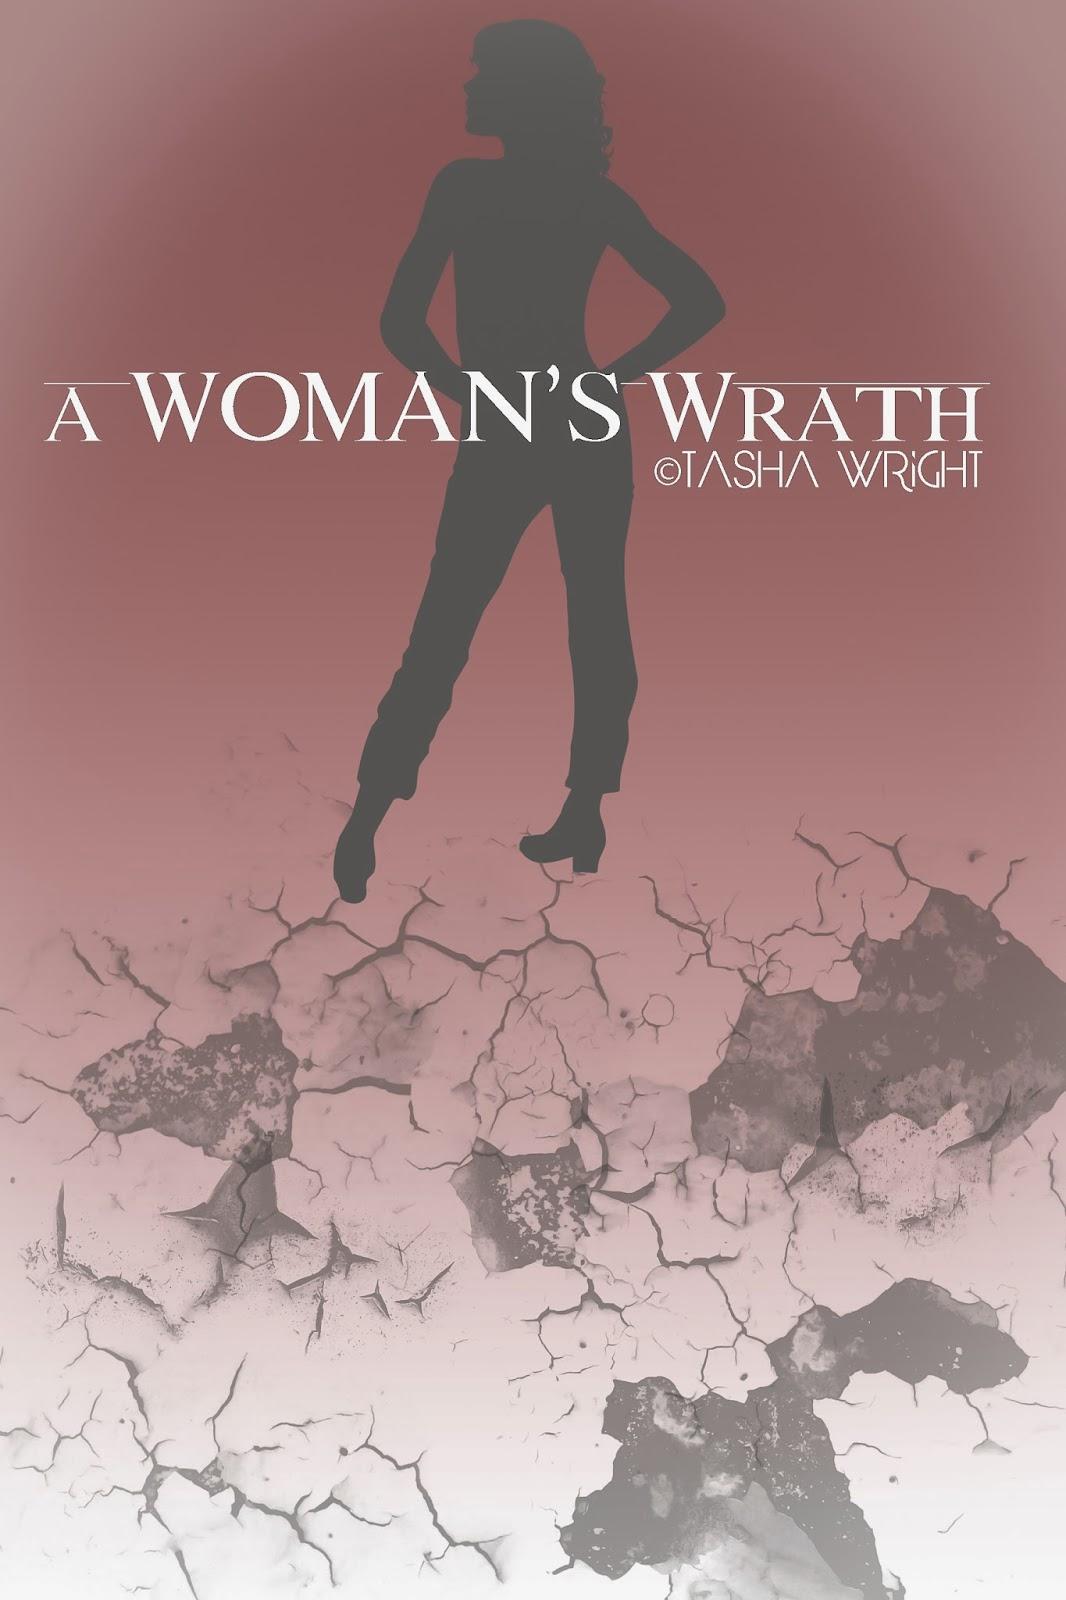 A Woman's Wrath